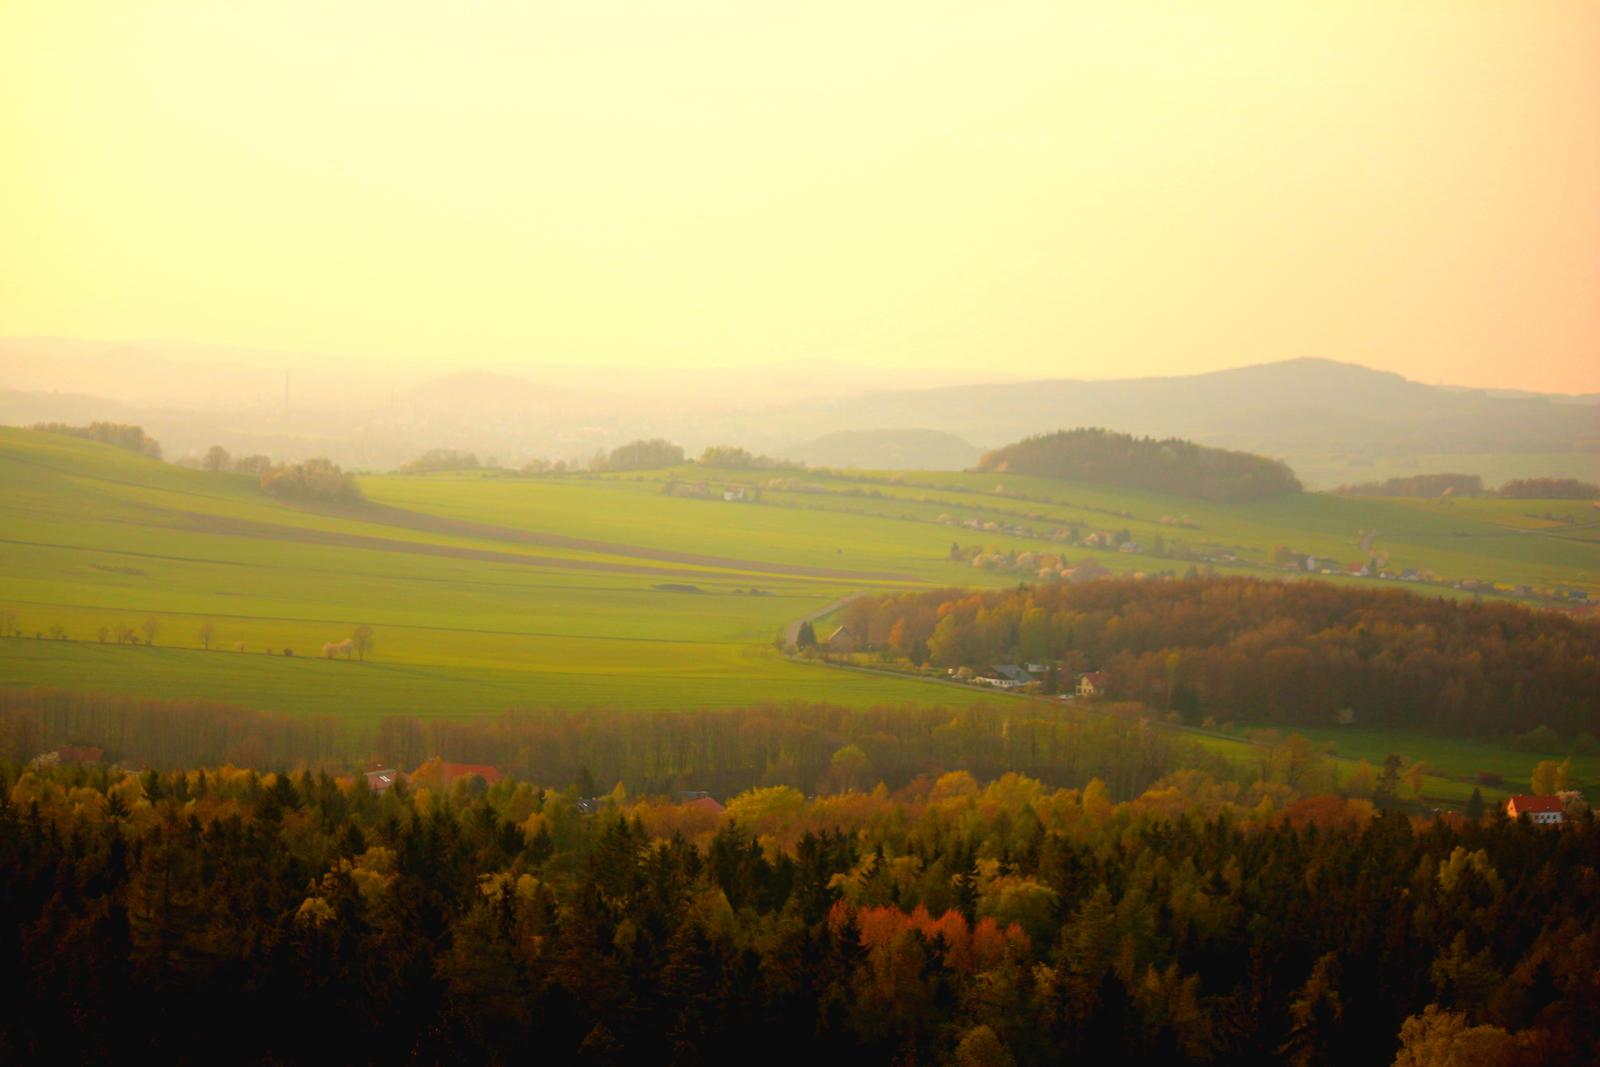 foggy landscape by LoveForDetails